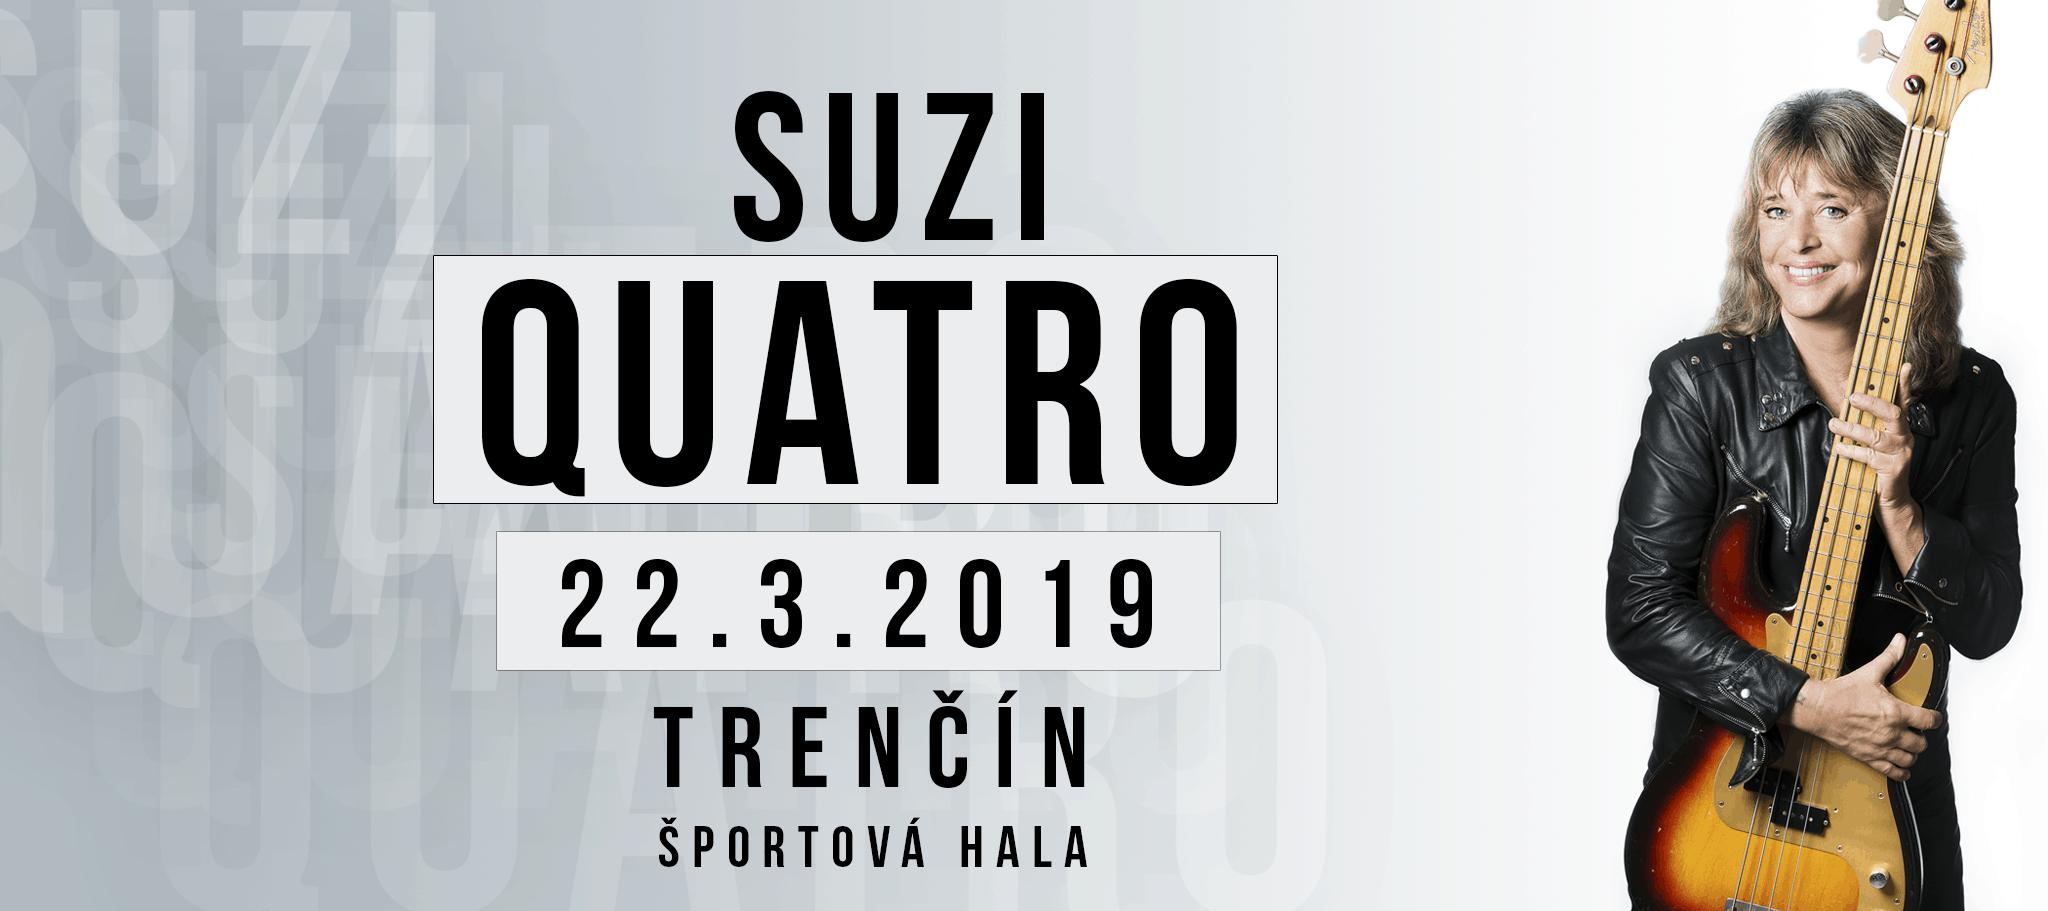 Unikátny hudobný festival Slovenské hrady bude už budúcu sobotu na Červenom  Kameni. - GREGI.NET  f249eaf562d